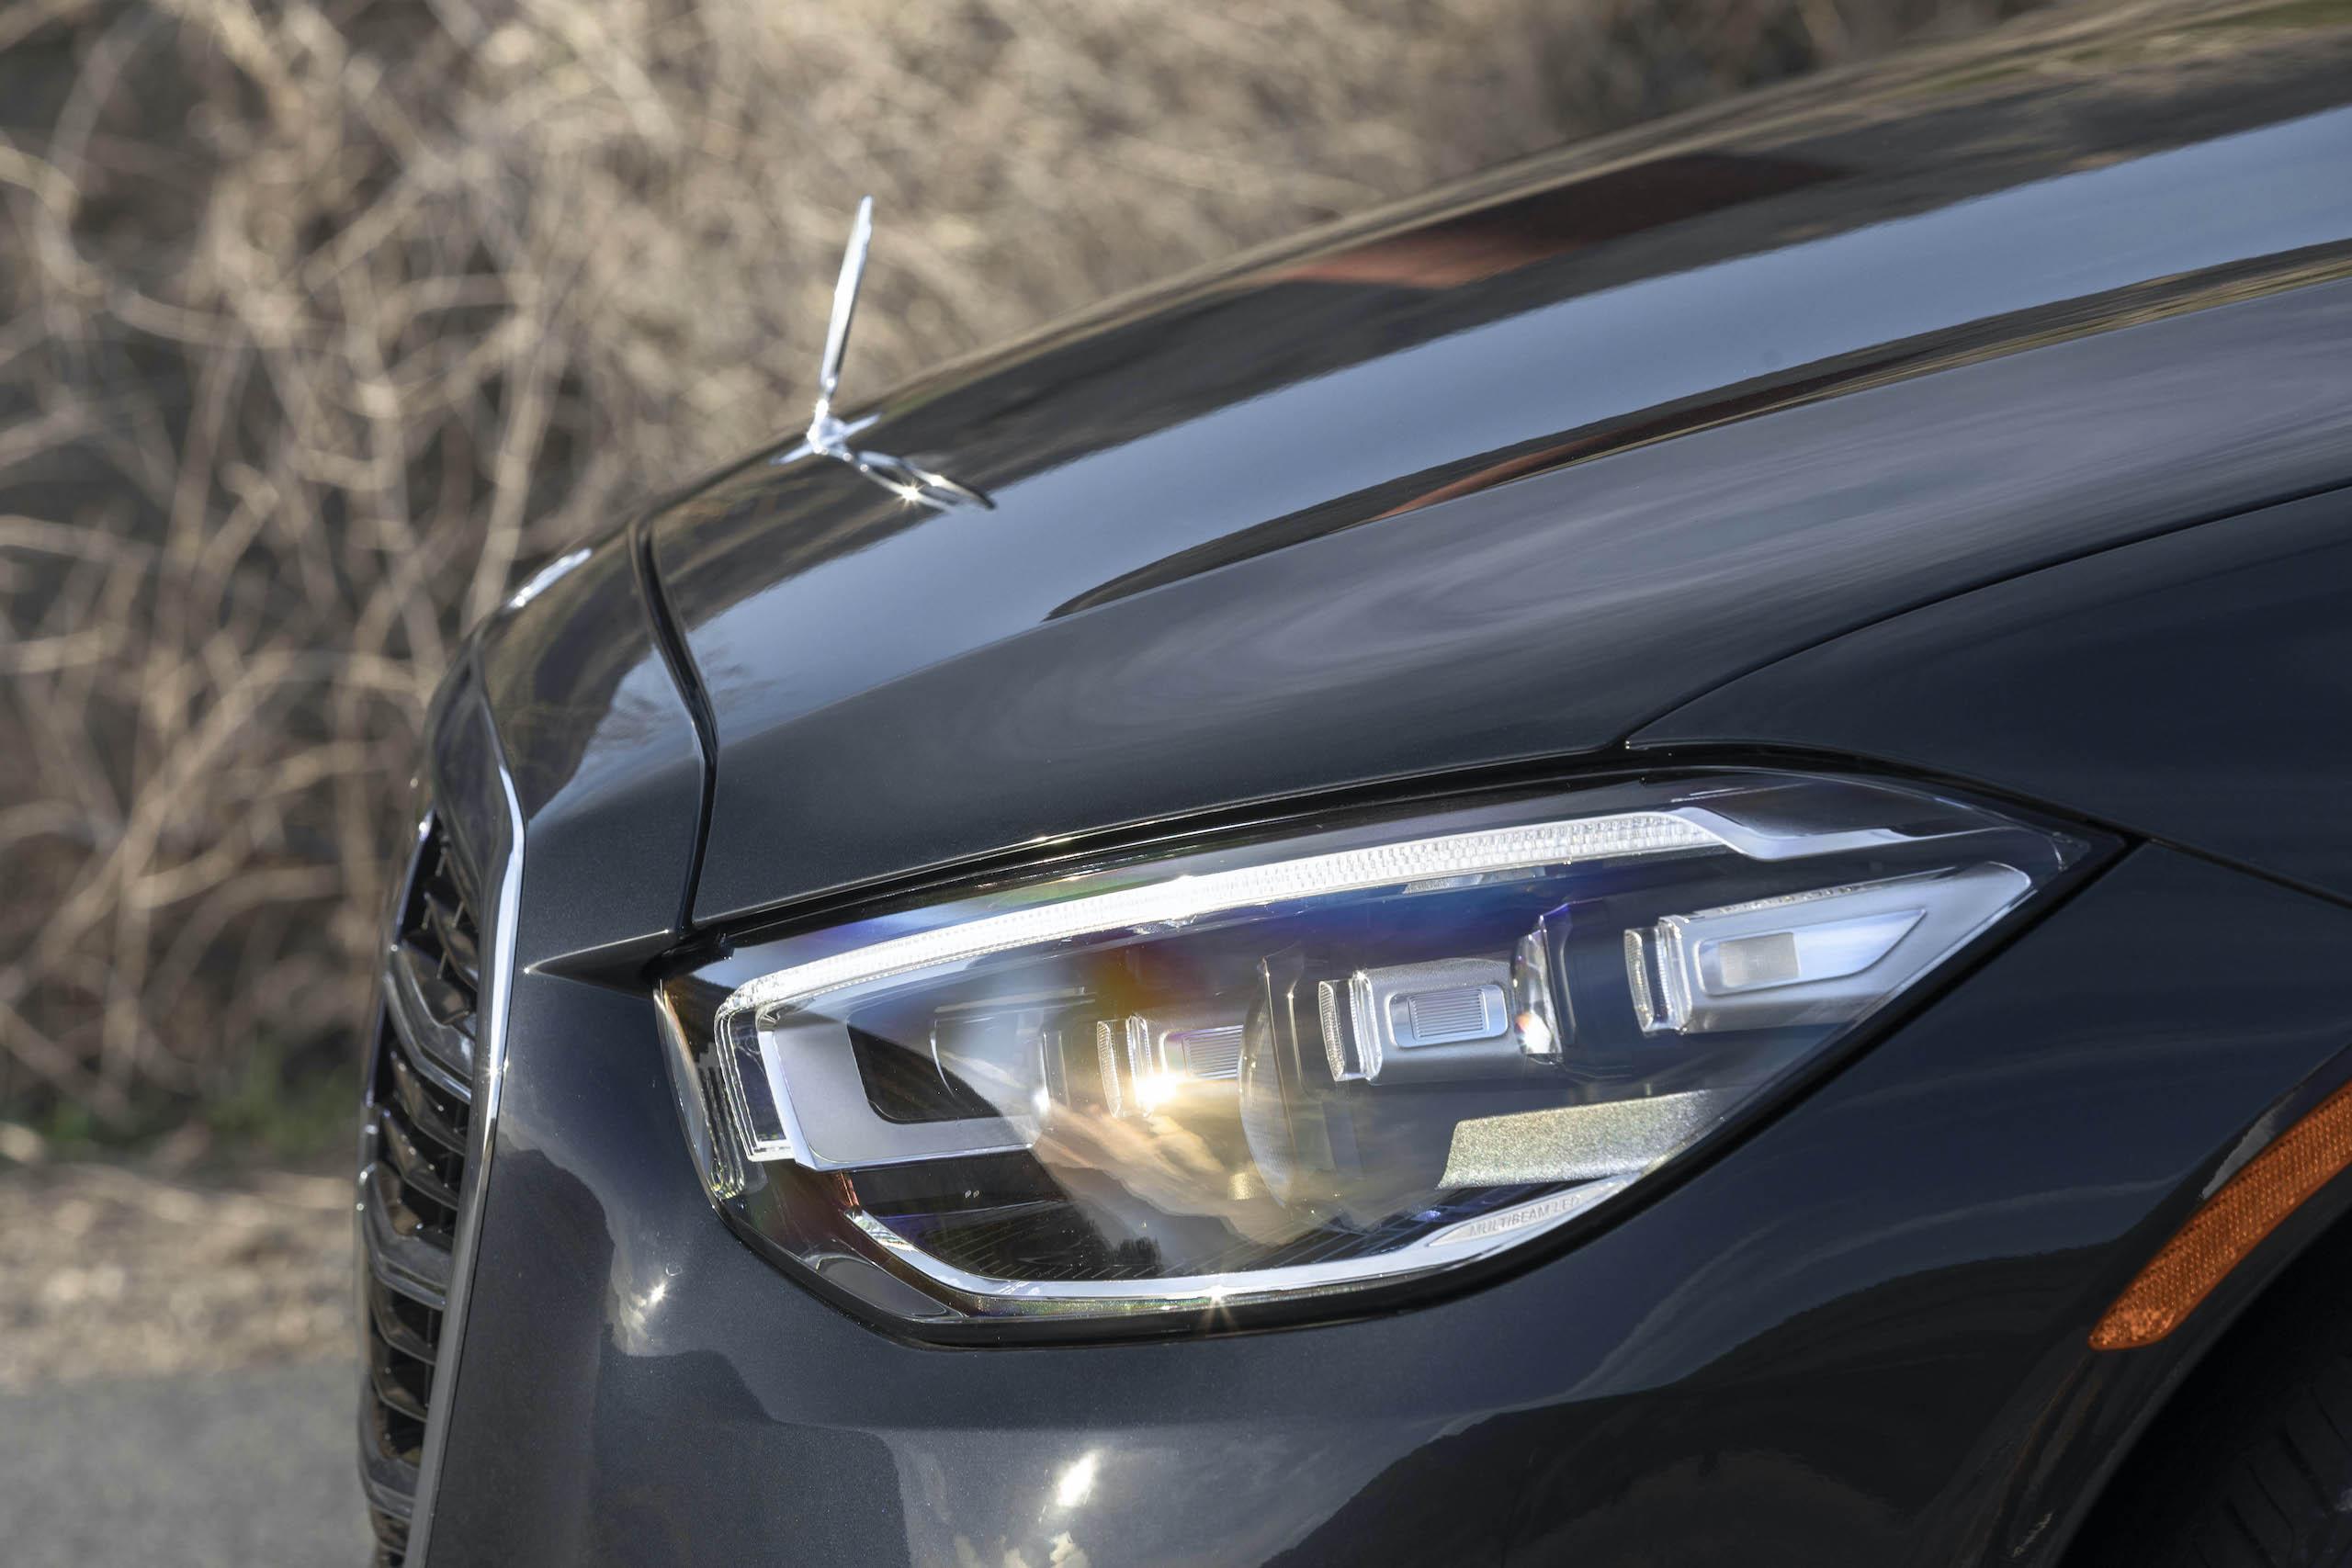 Mercedes Benz-S-Class front fascia side profile